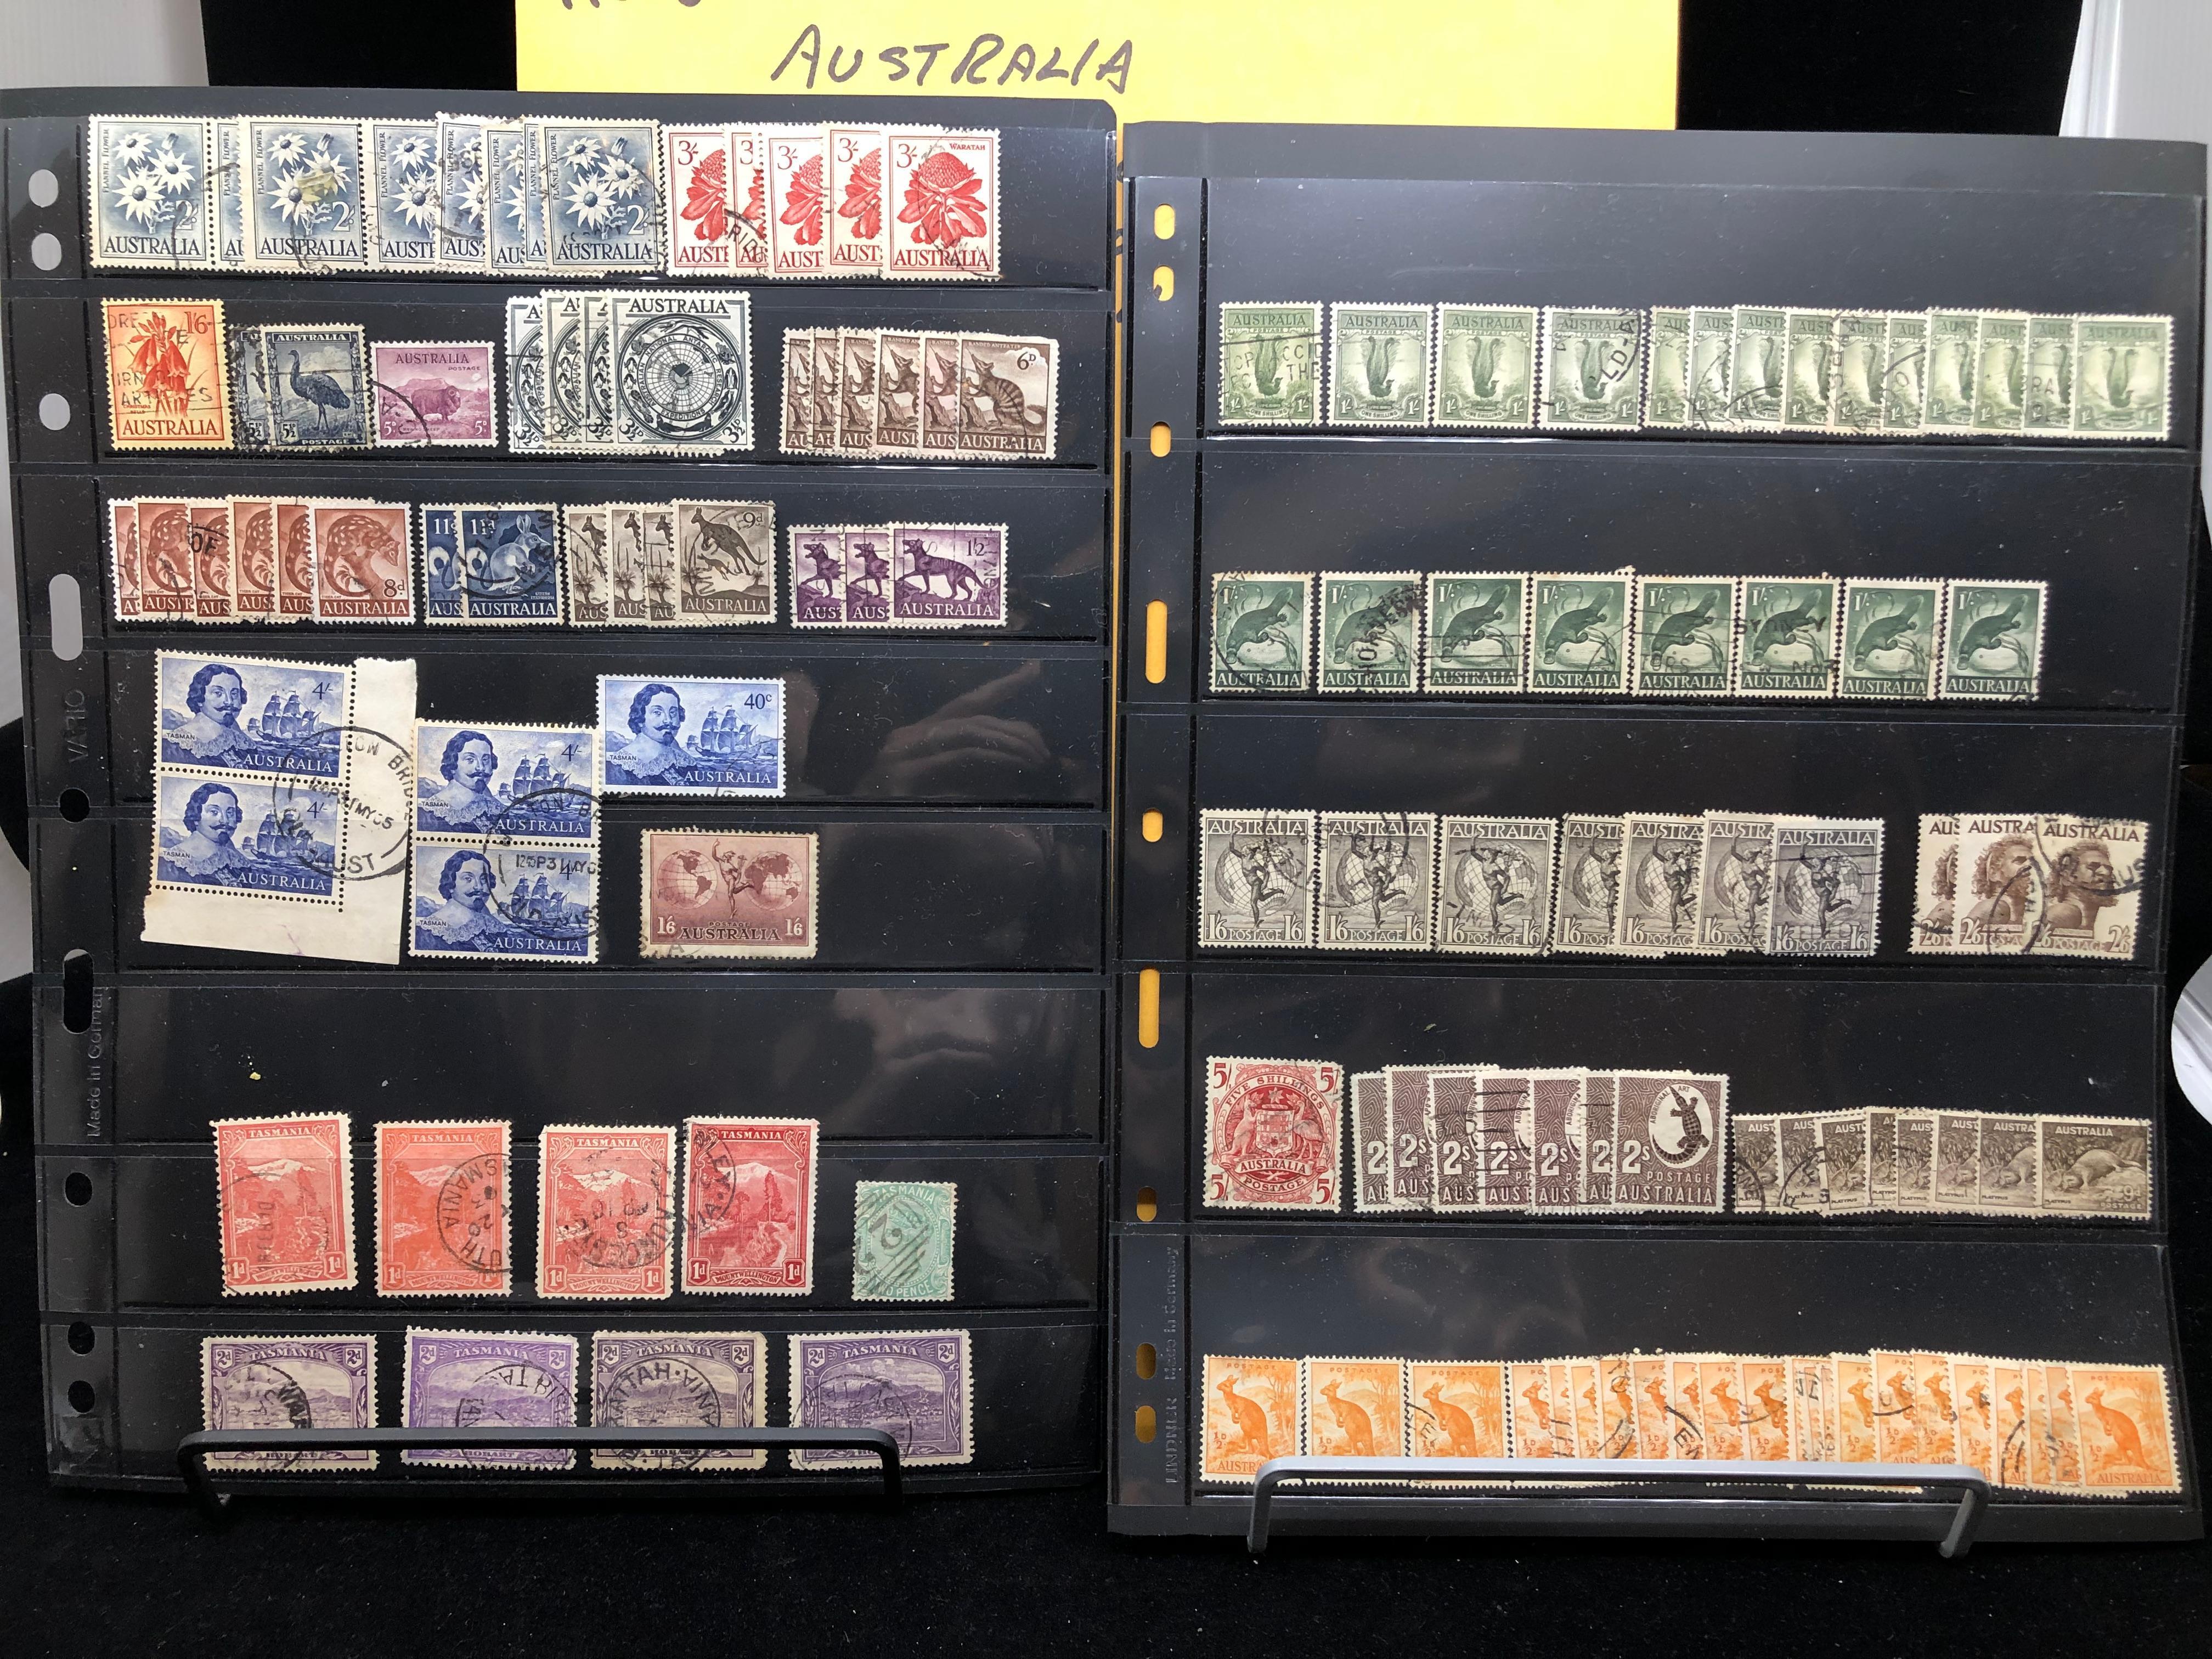 Austria Stamp Collection and Tasmania